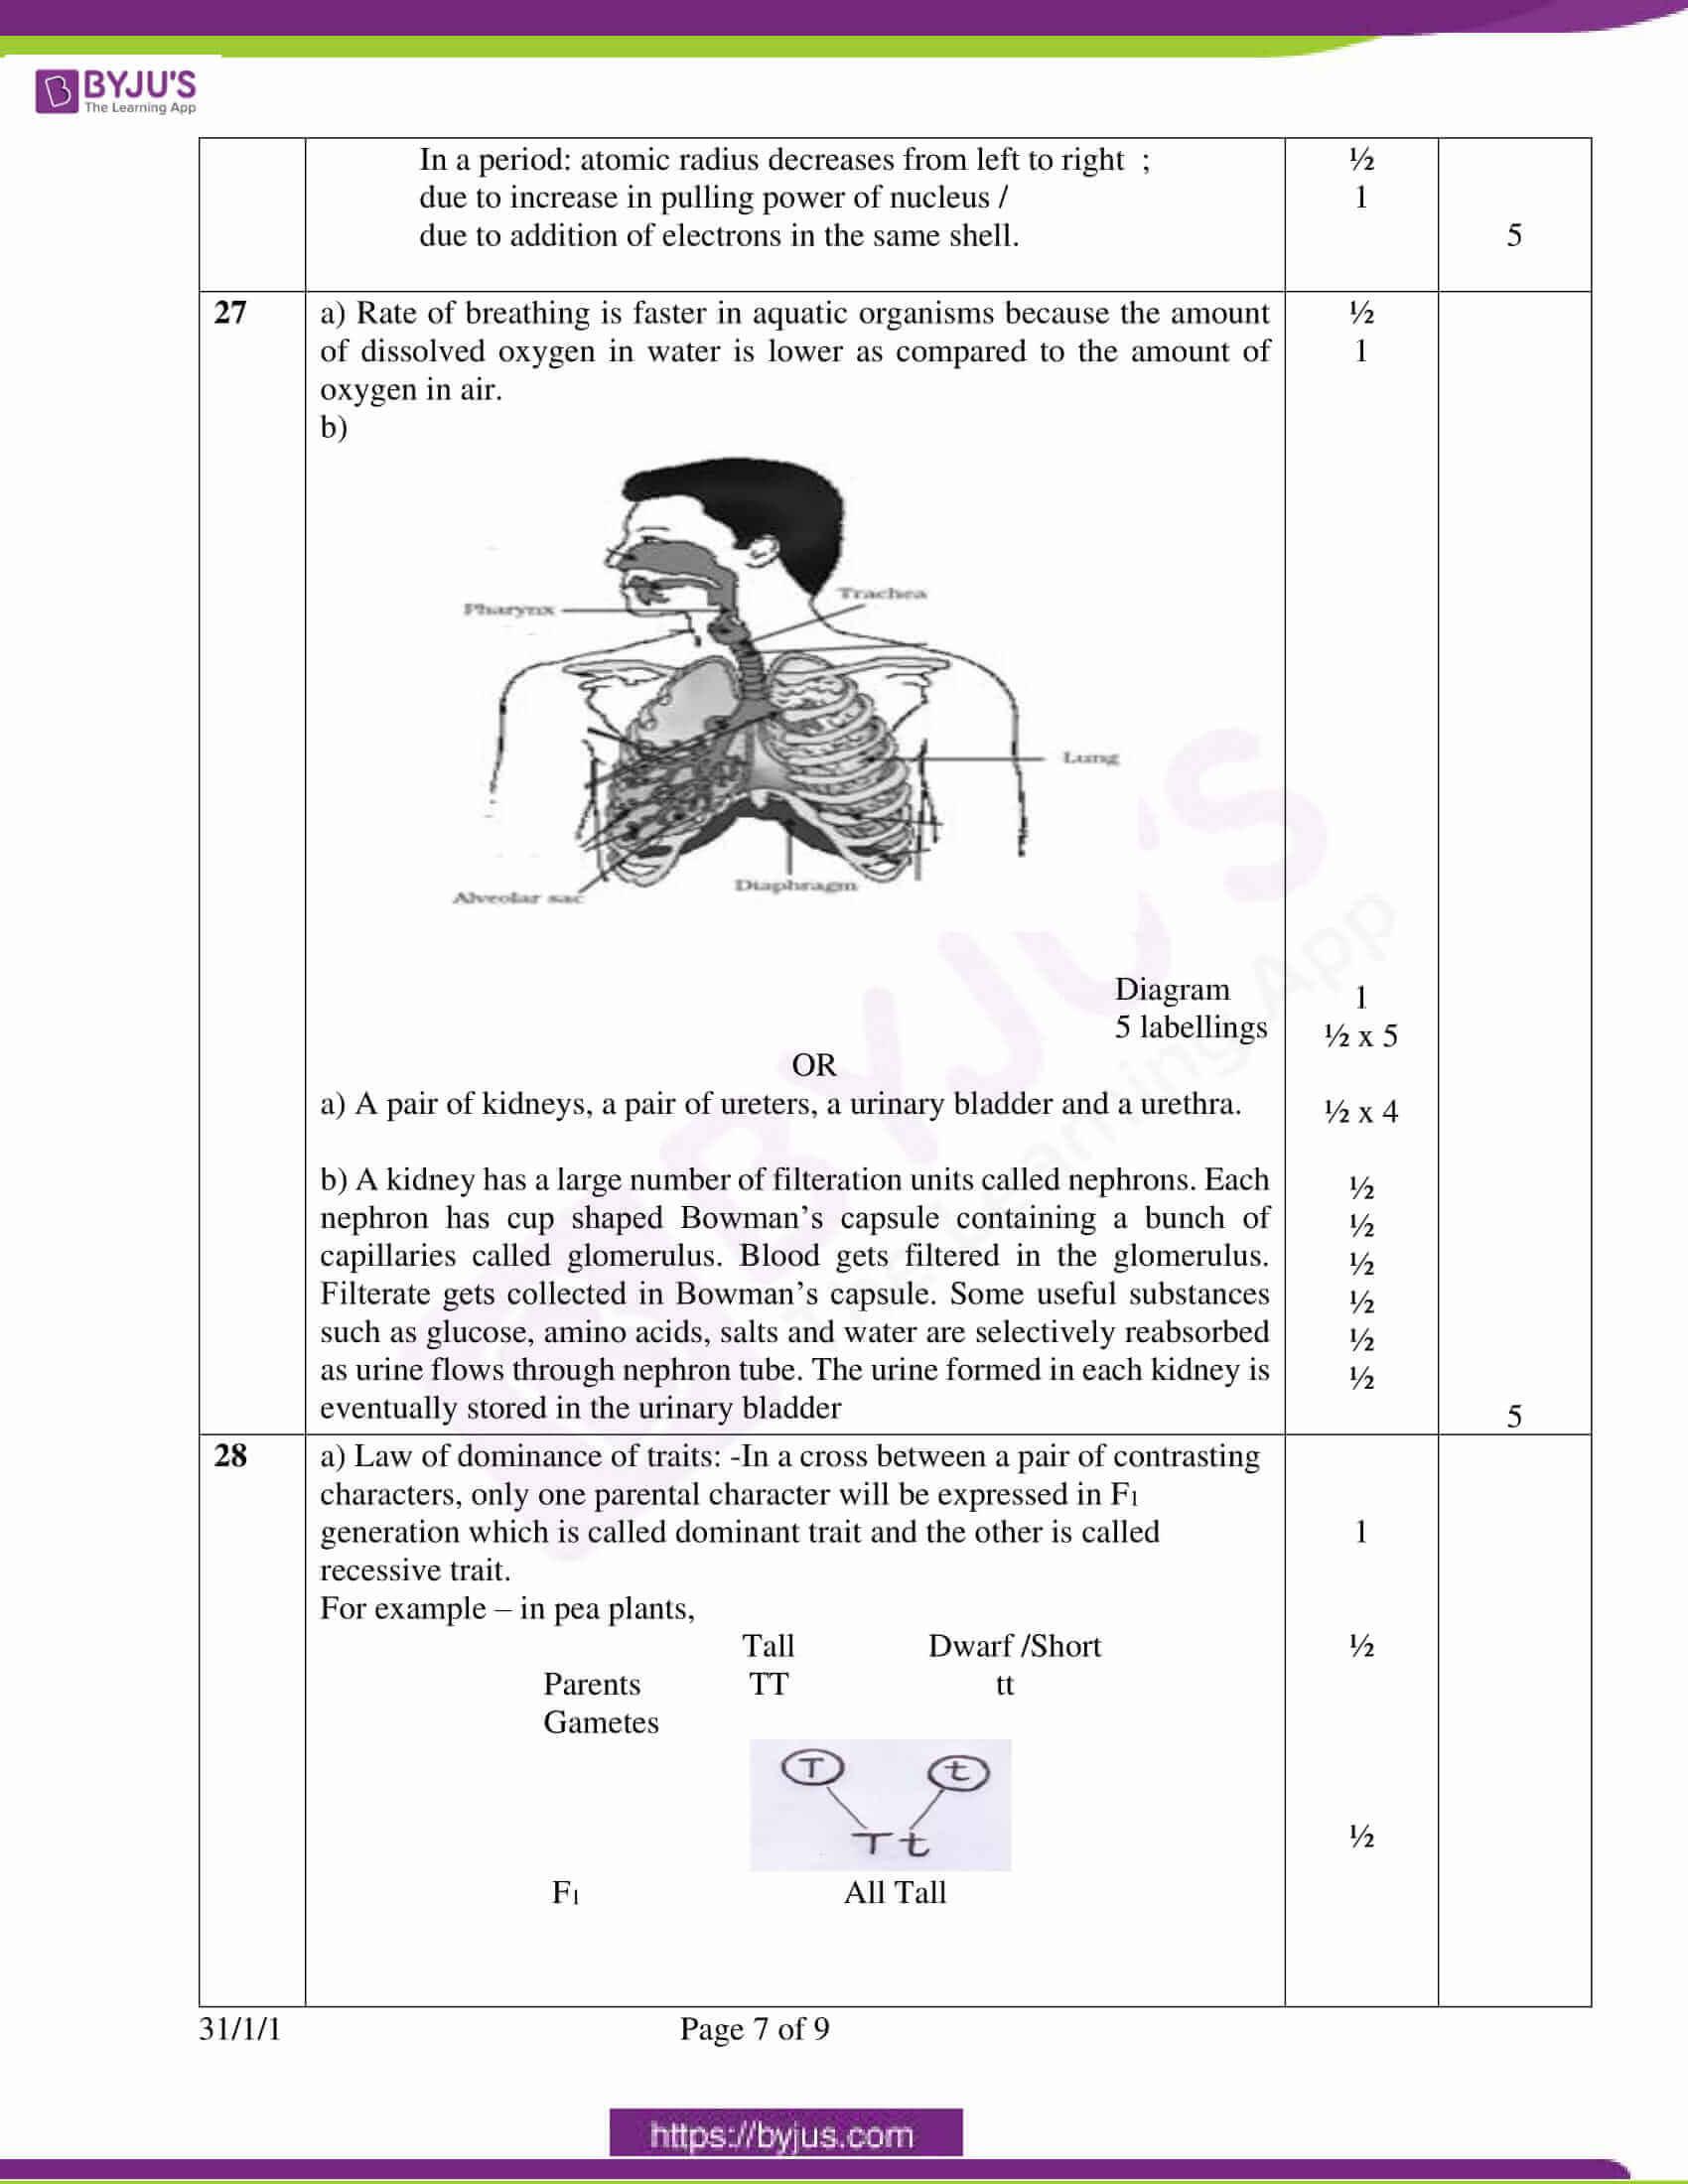 cbse class 10 science question paper set 3 solution 2020 5